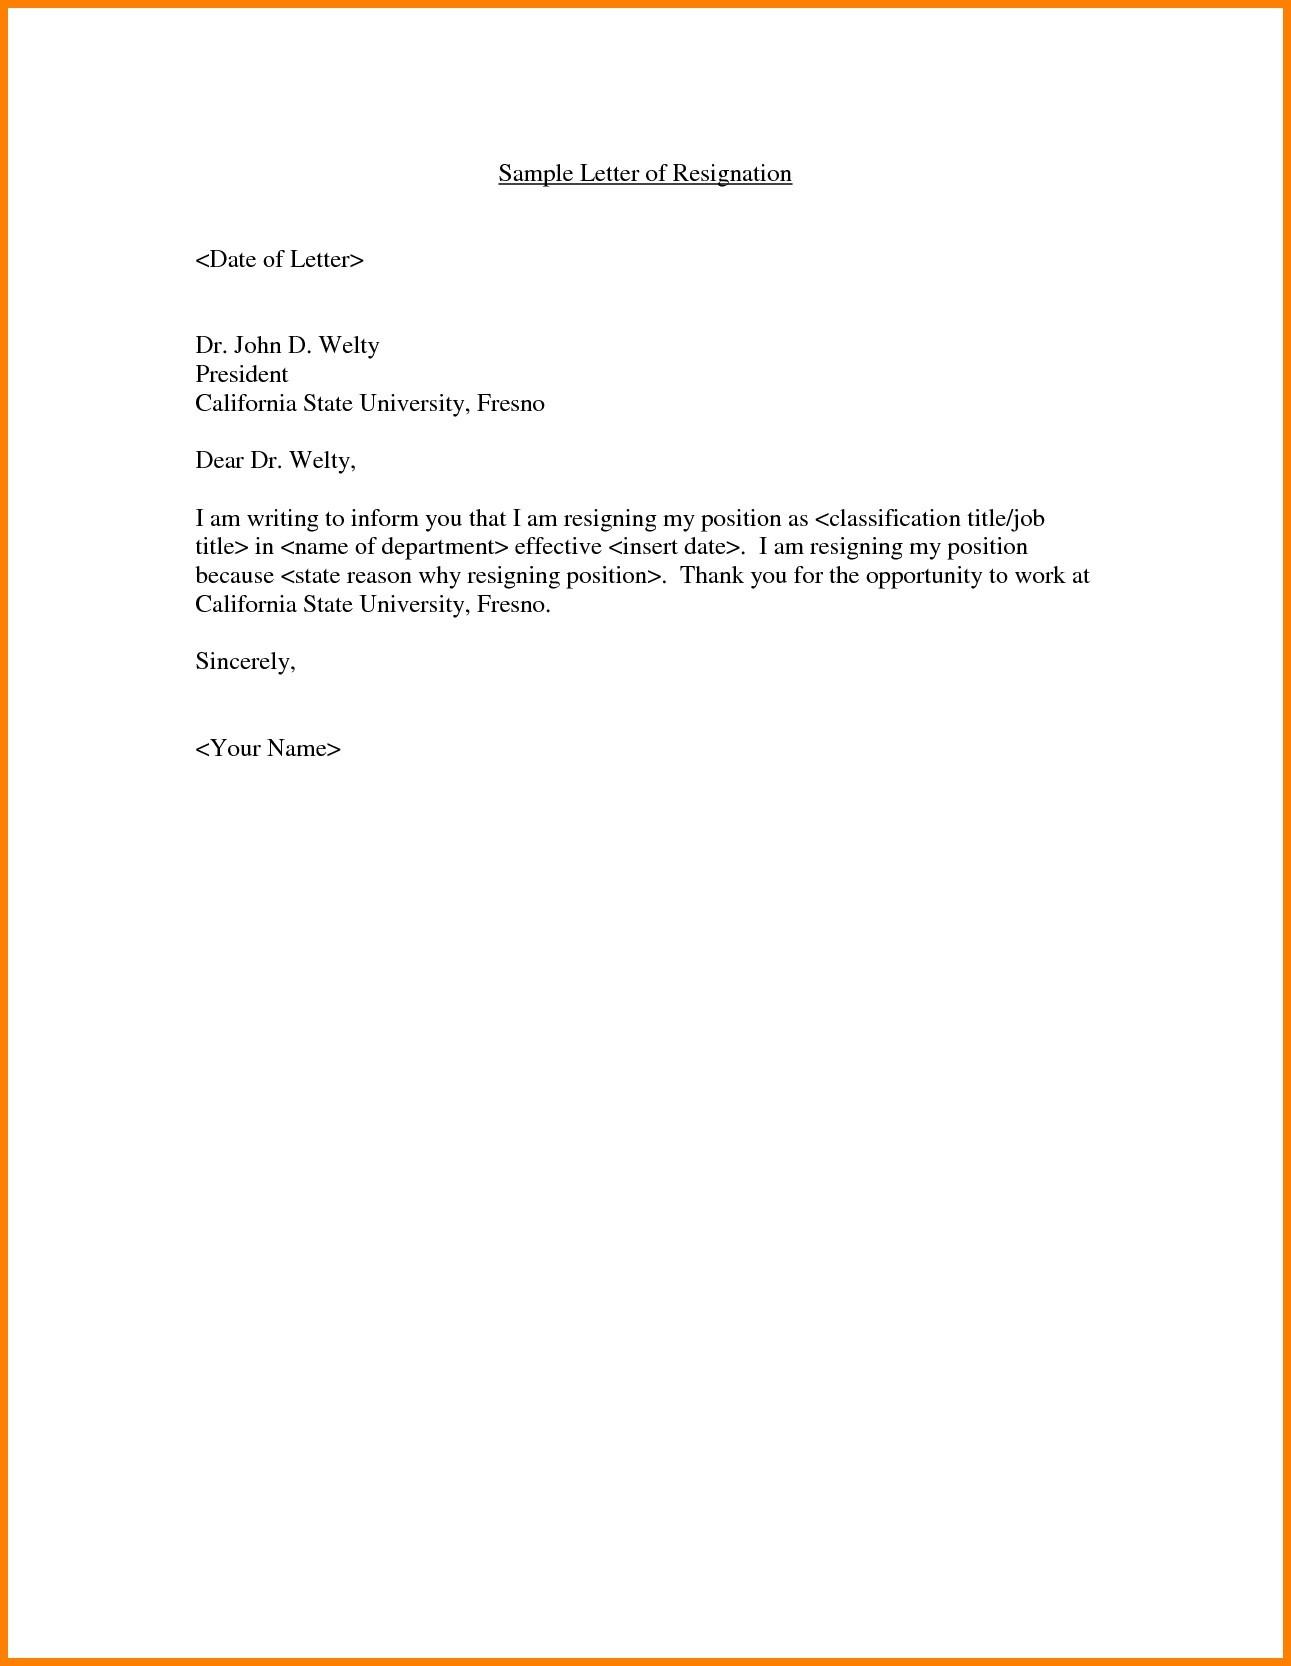 Resignation Letter Template Doc - Employment Fer Letter Template Doc Copy Resignation Letter Sample